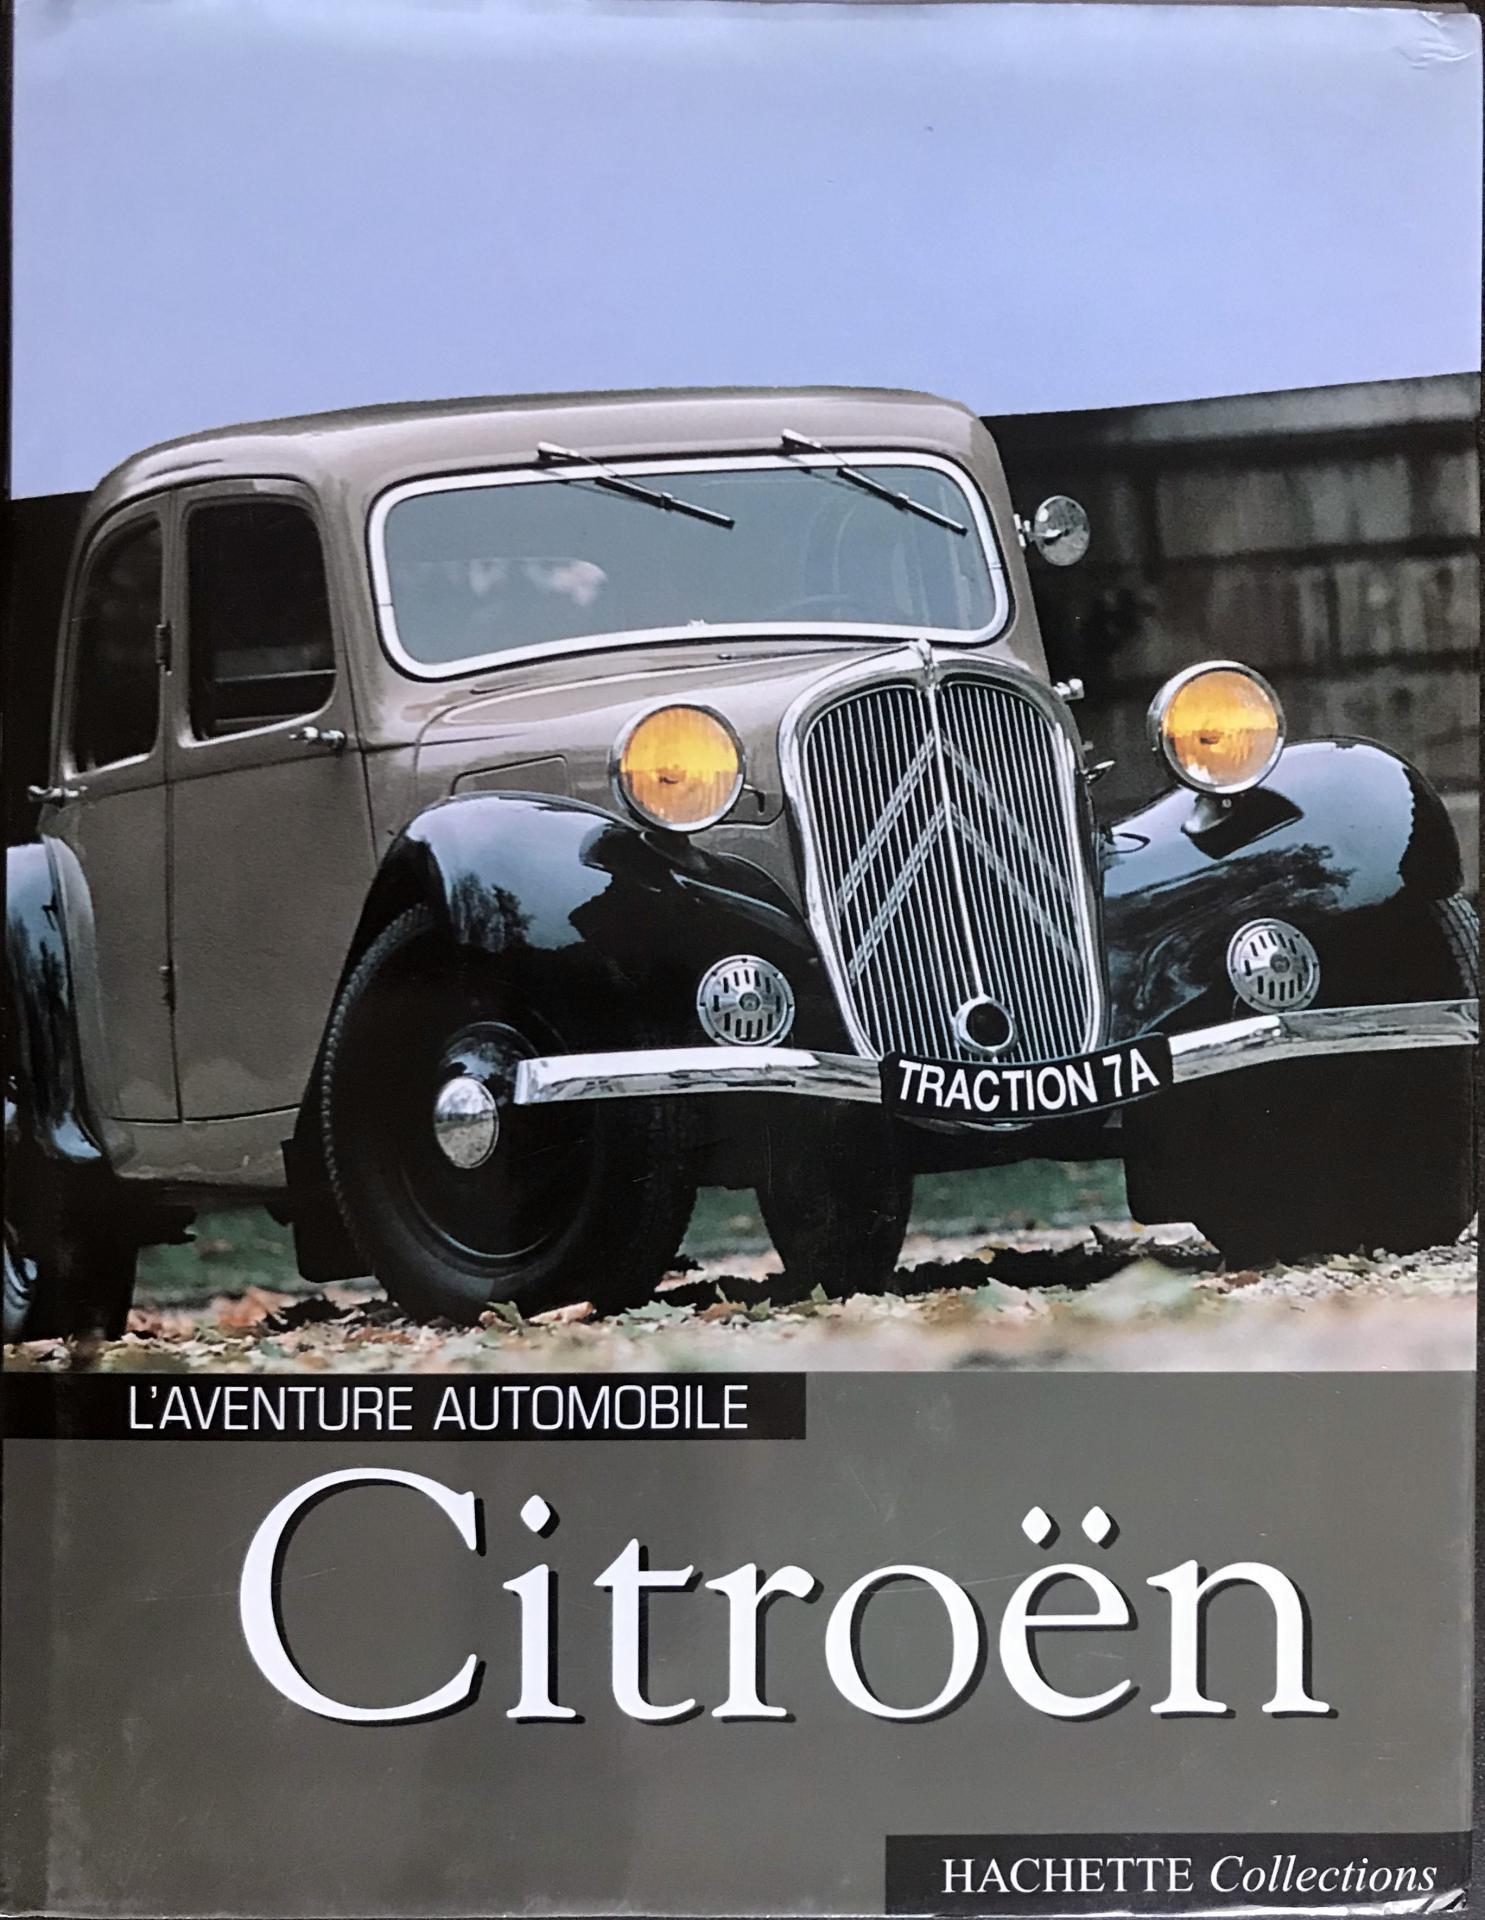 2006 l'Aventure automobile Citroën